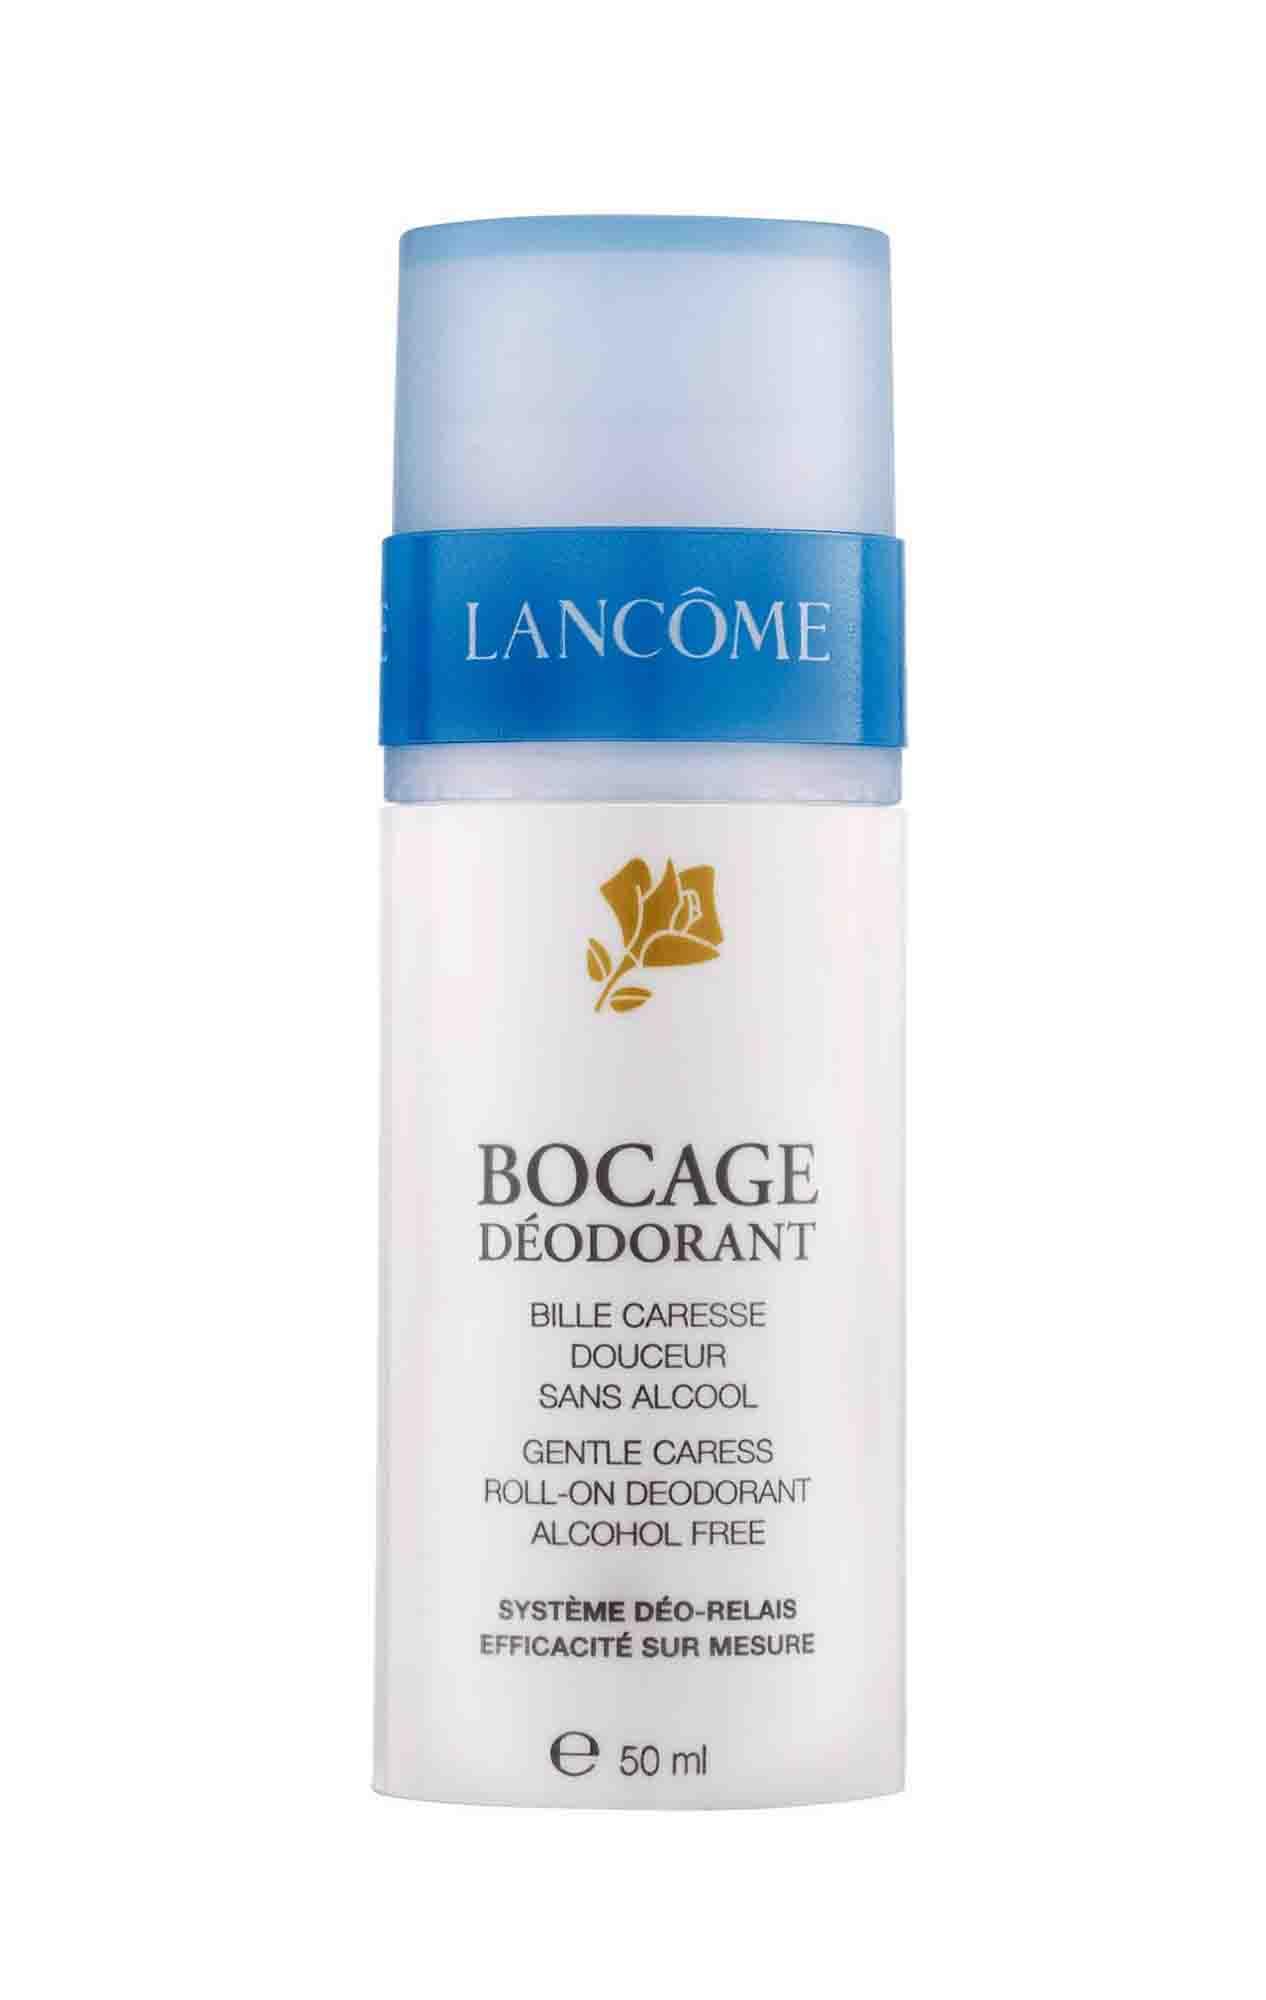 Lancôme Körperpflege Bocage Déodorant Roll-On 50 ml 711102